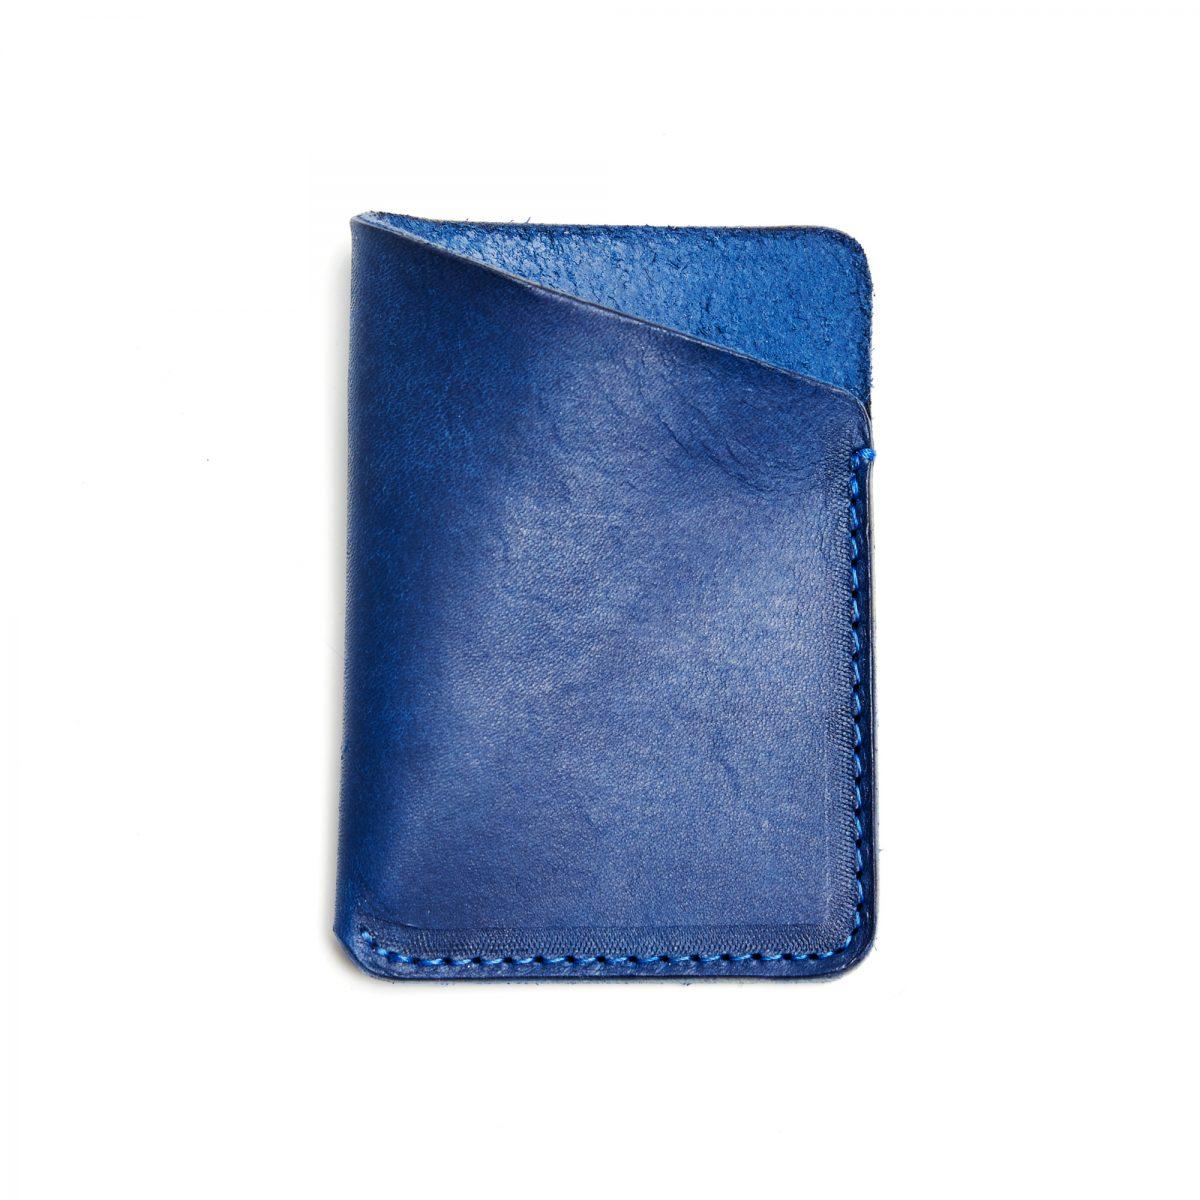 Pass holder by Studio Rosanne Bergsma